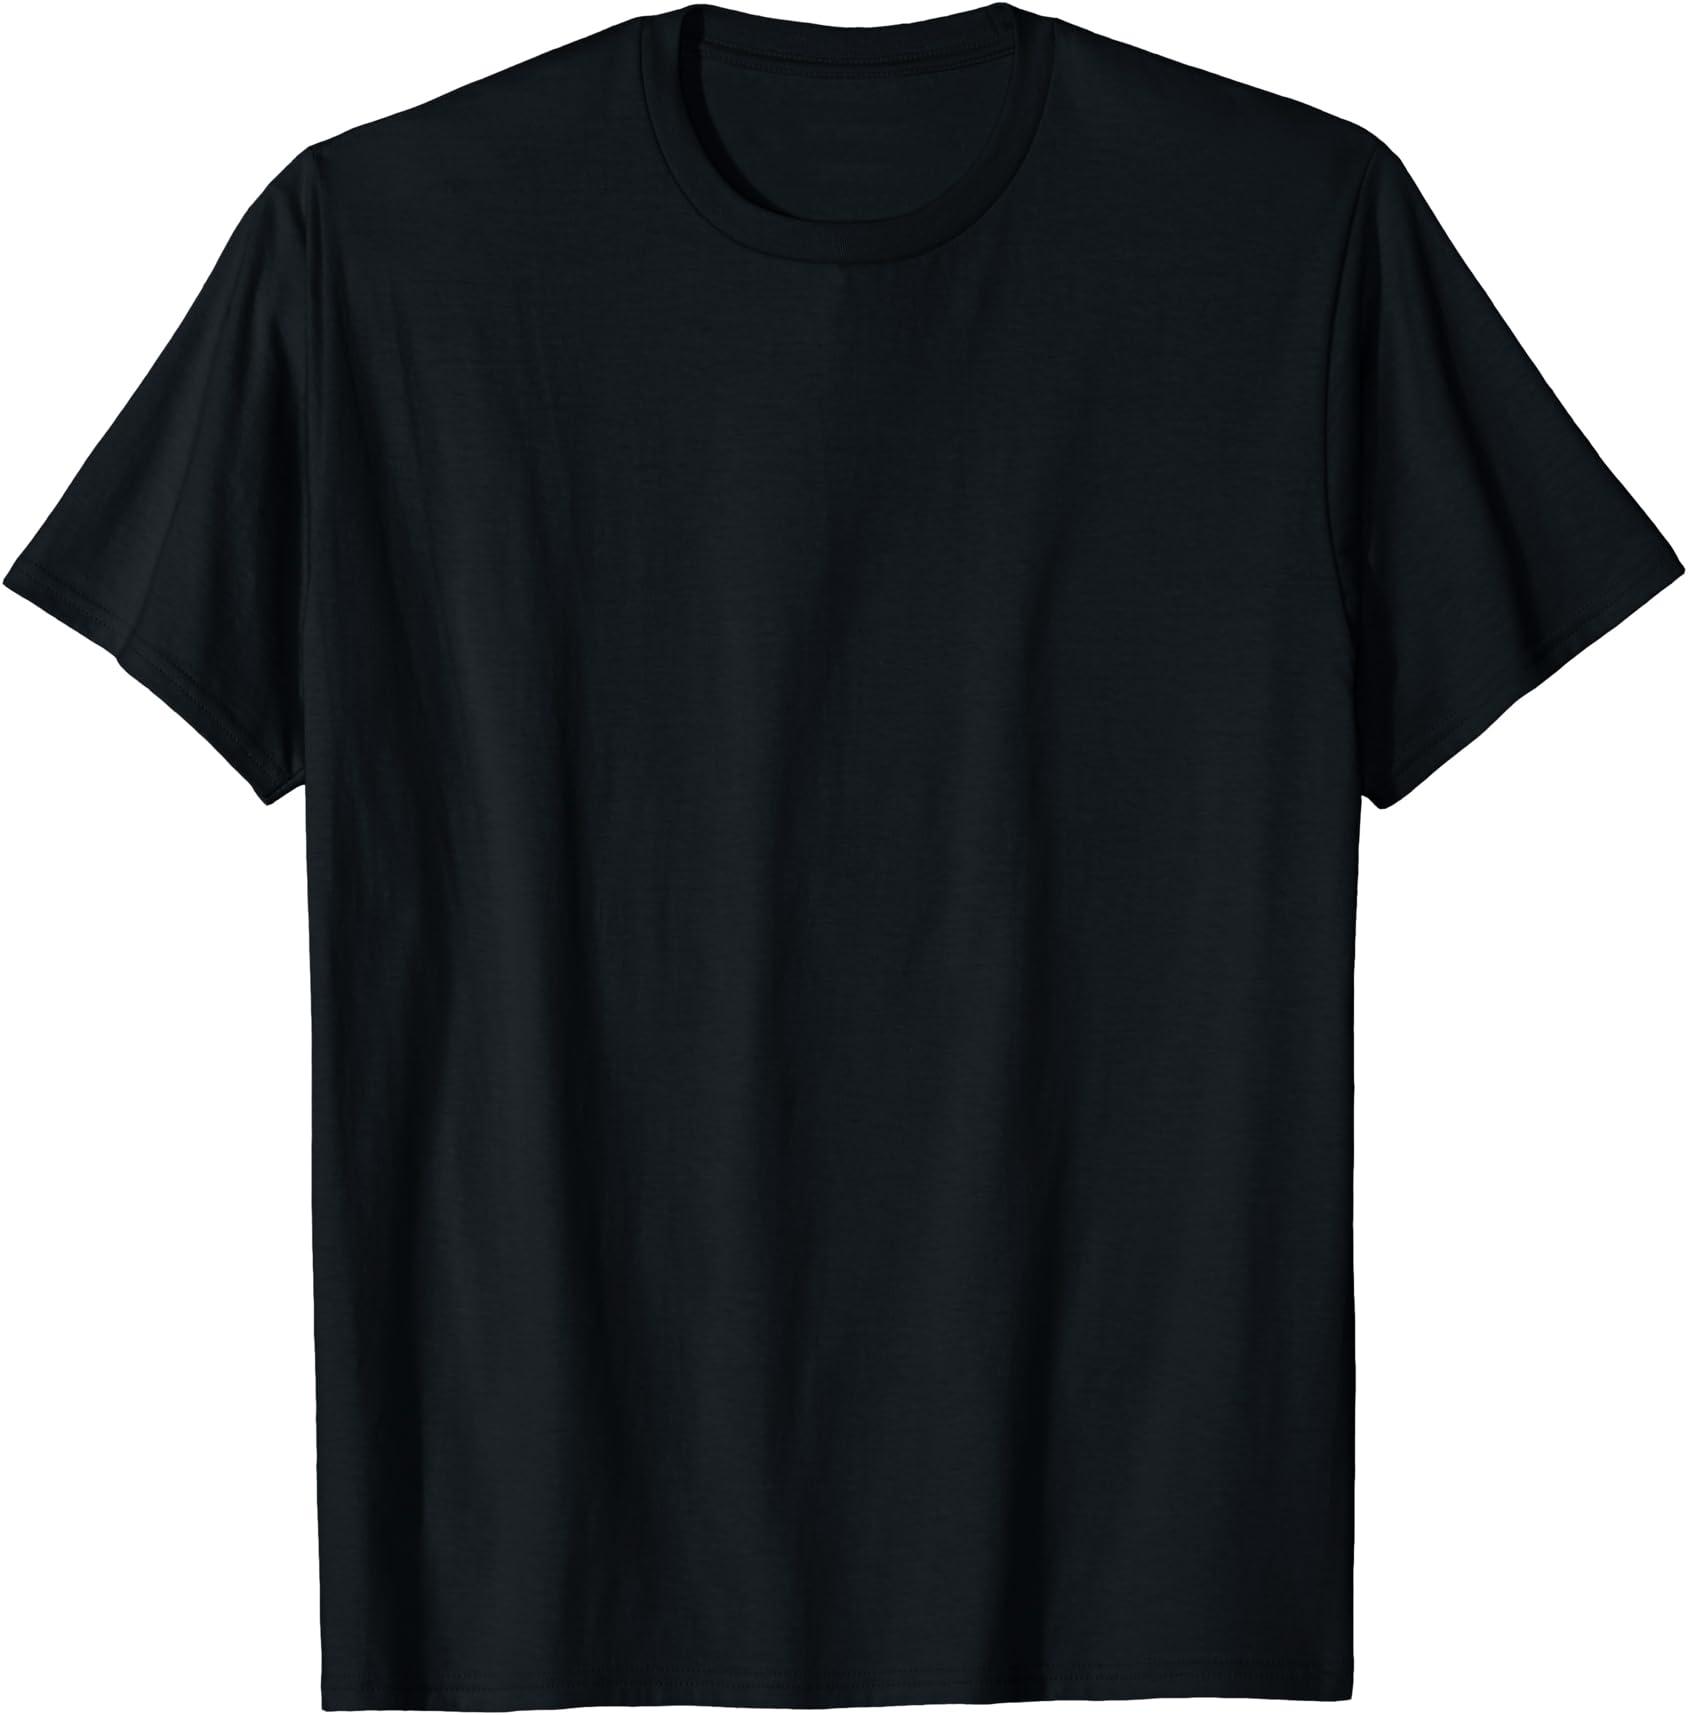 T-Shirts Sizes S-3XL New Authentic PEZ Halloween Mens T-Shirt